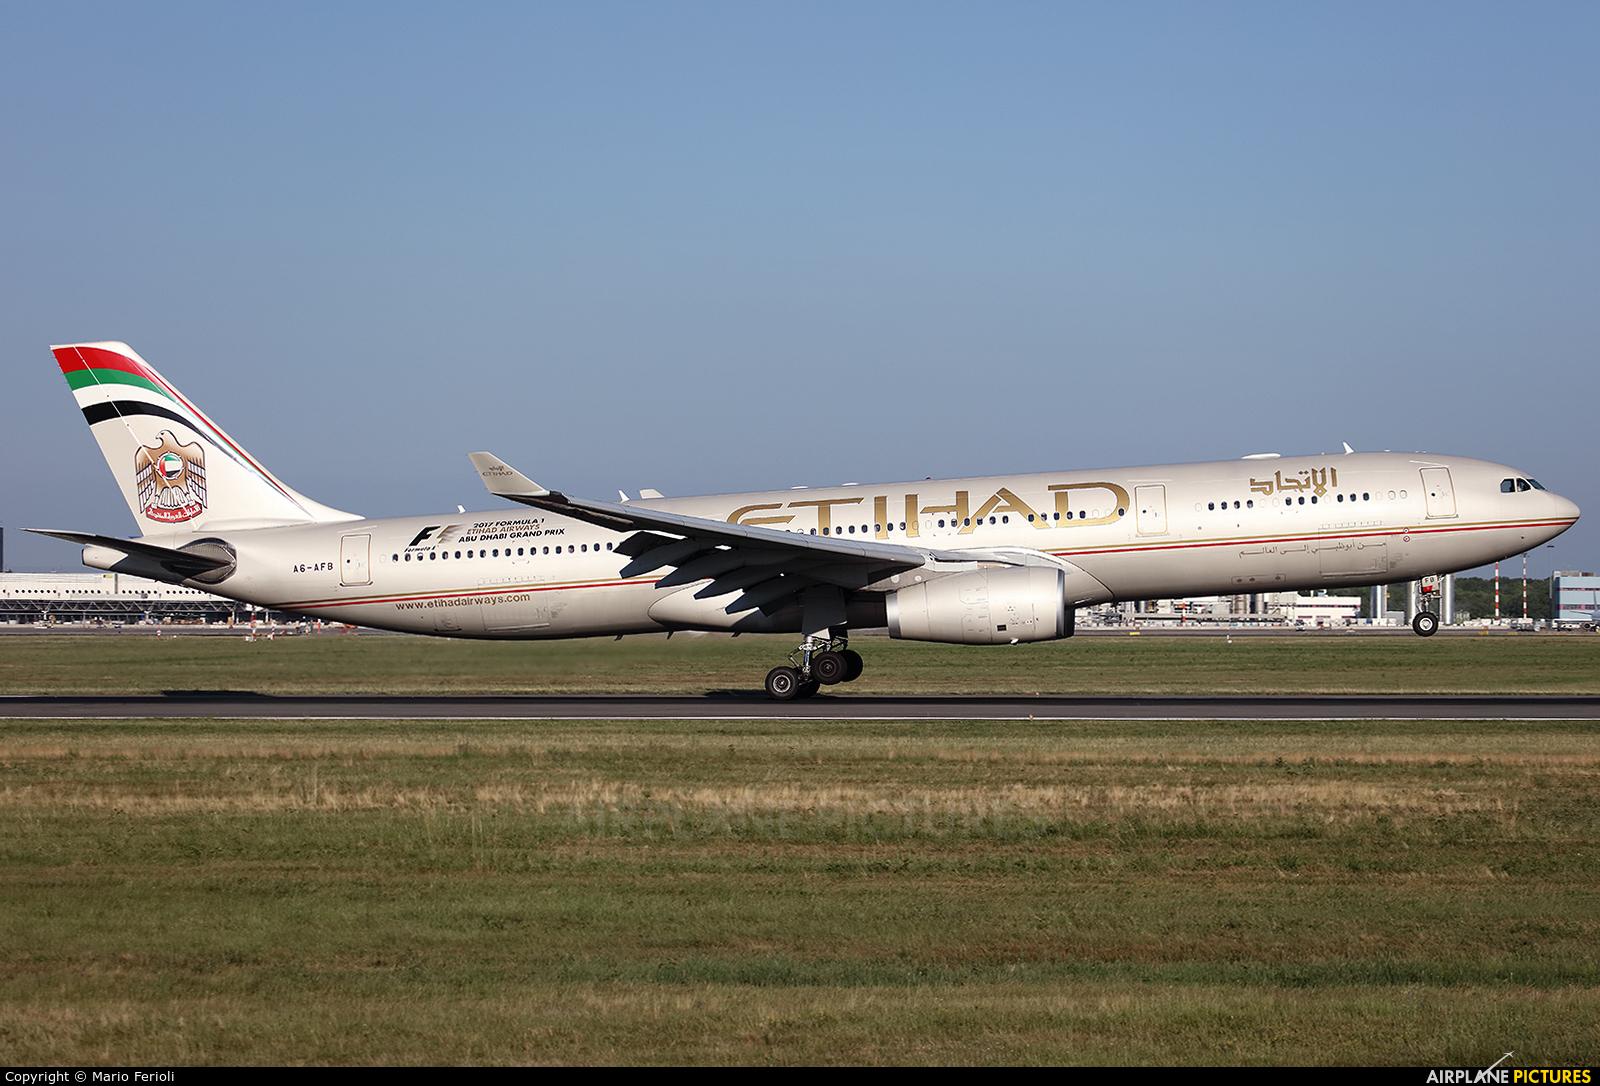 Etihad Airways A6-AFB aircraft at Milan - Malpensa